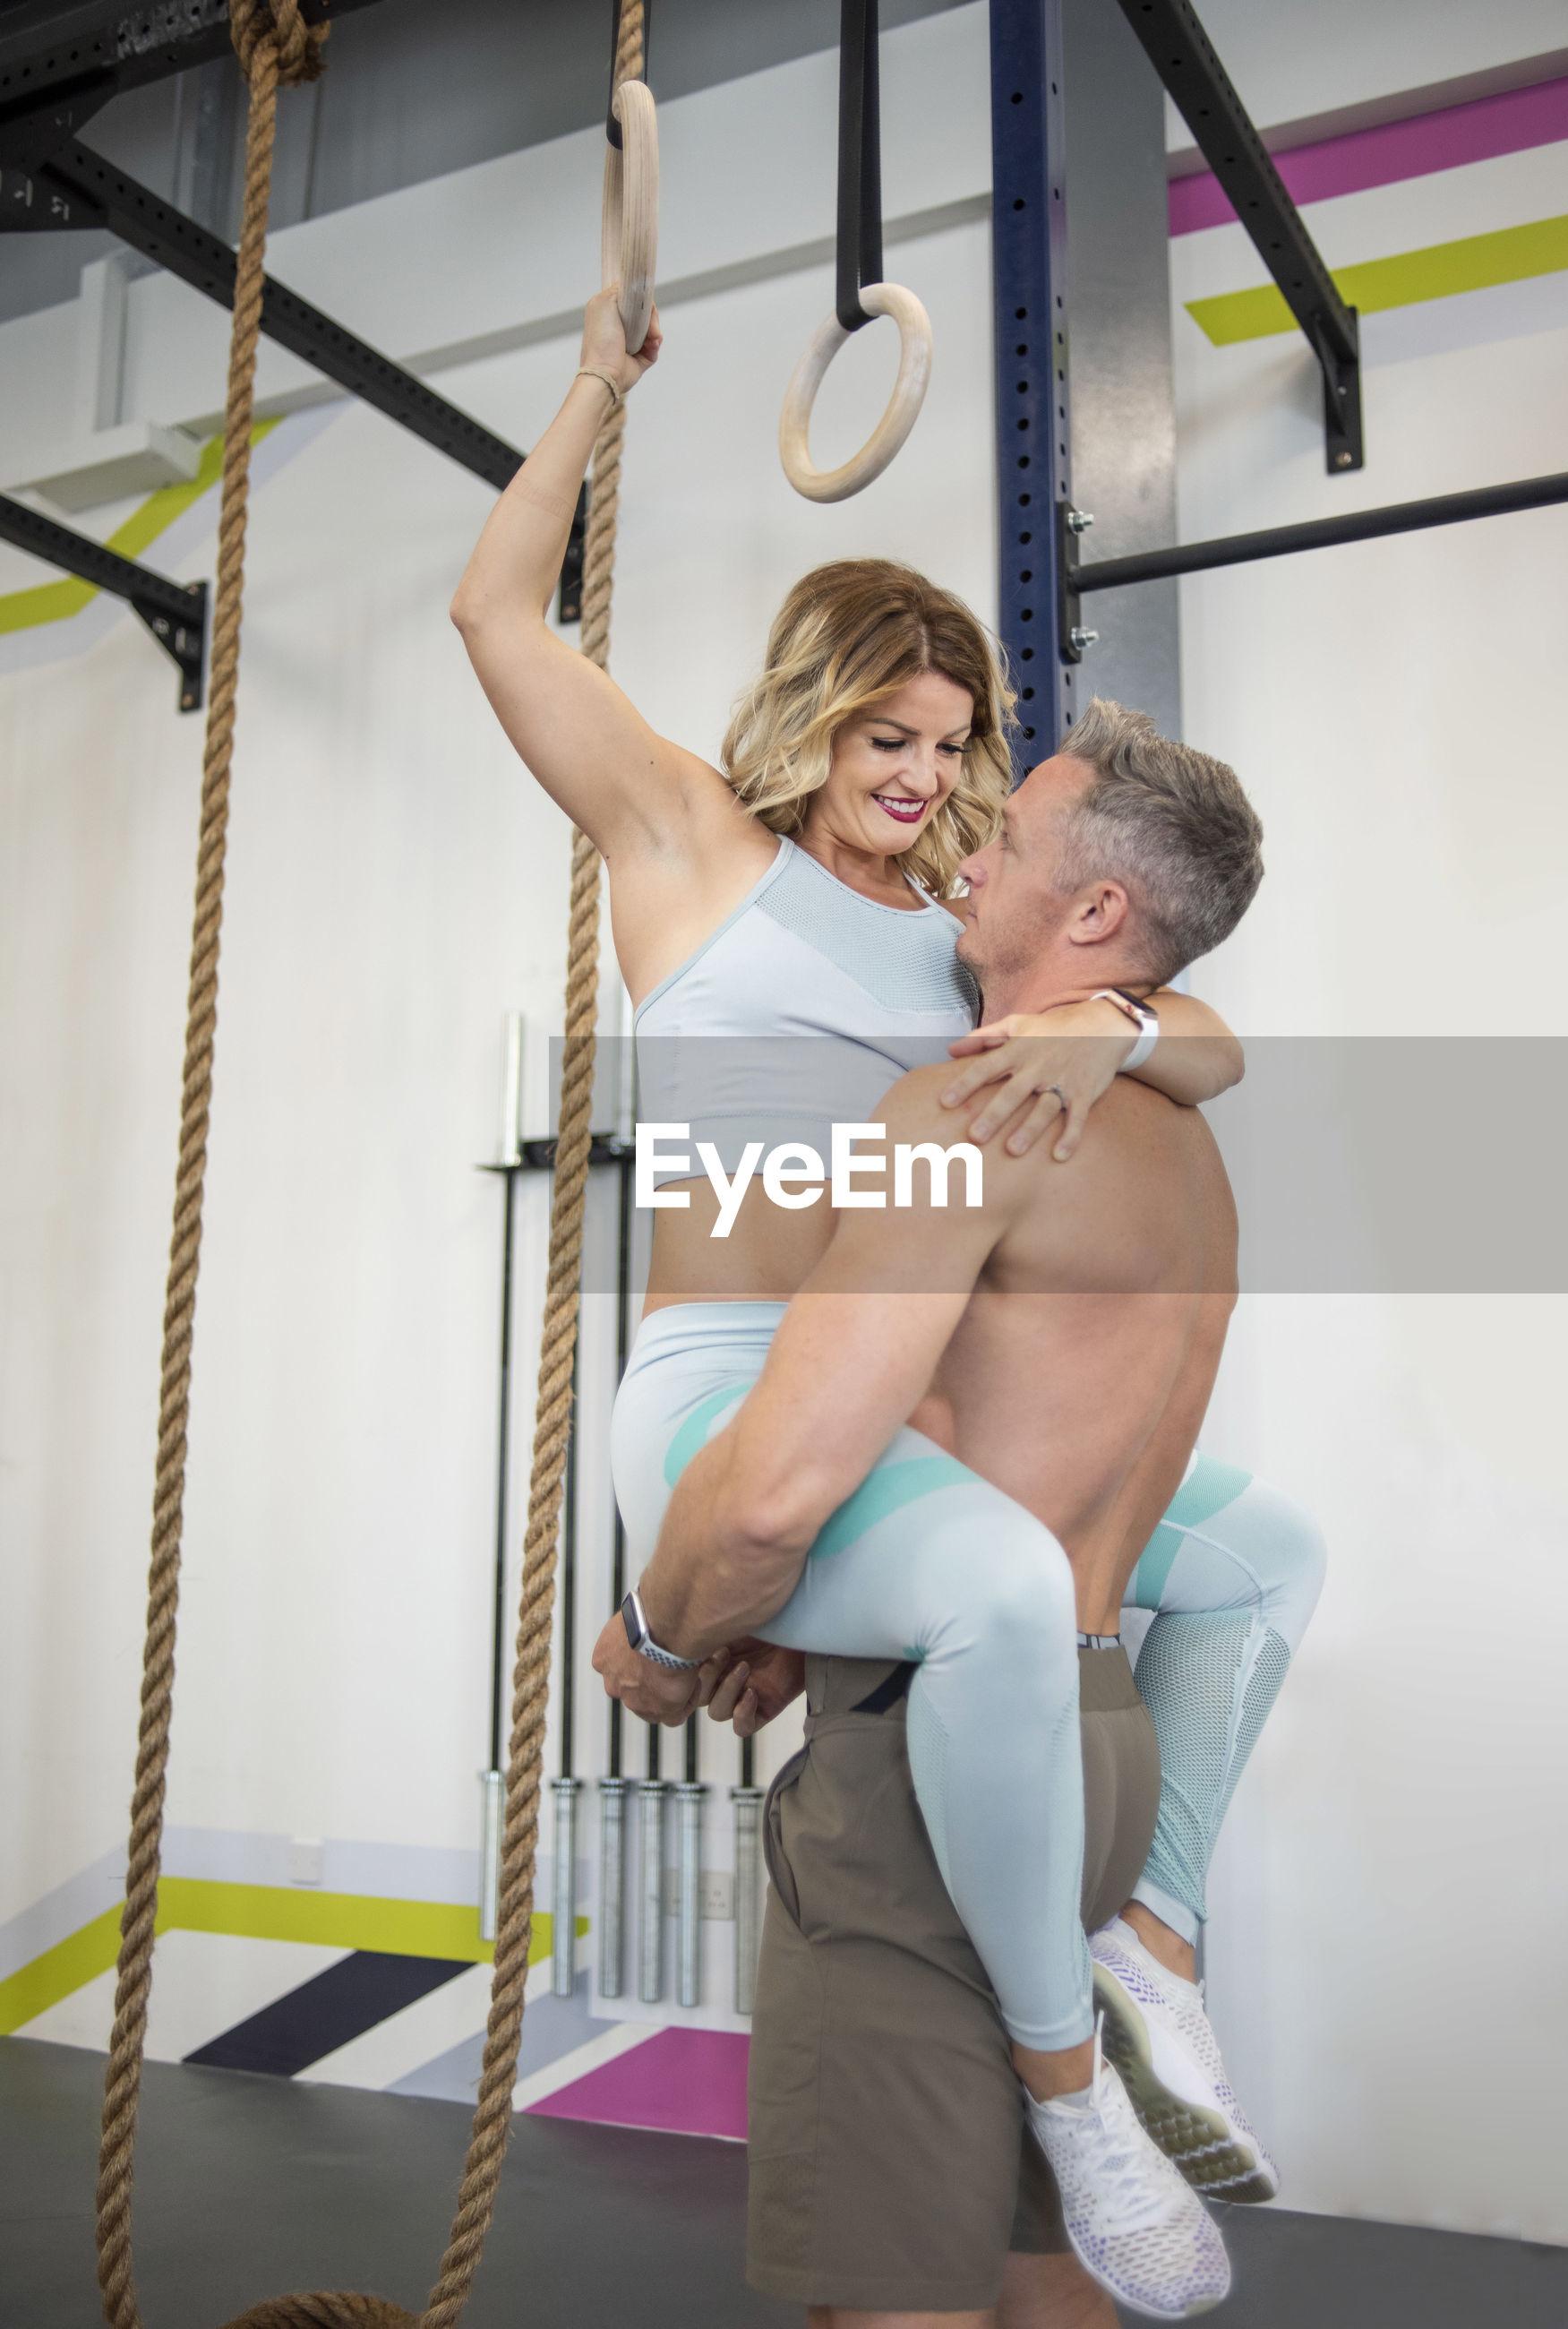 Shirtless man lifting woman at gym